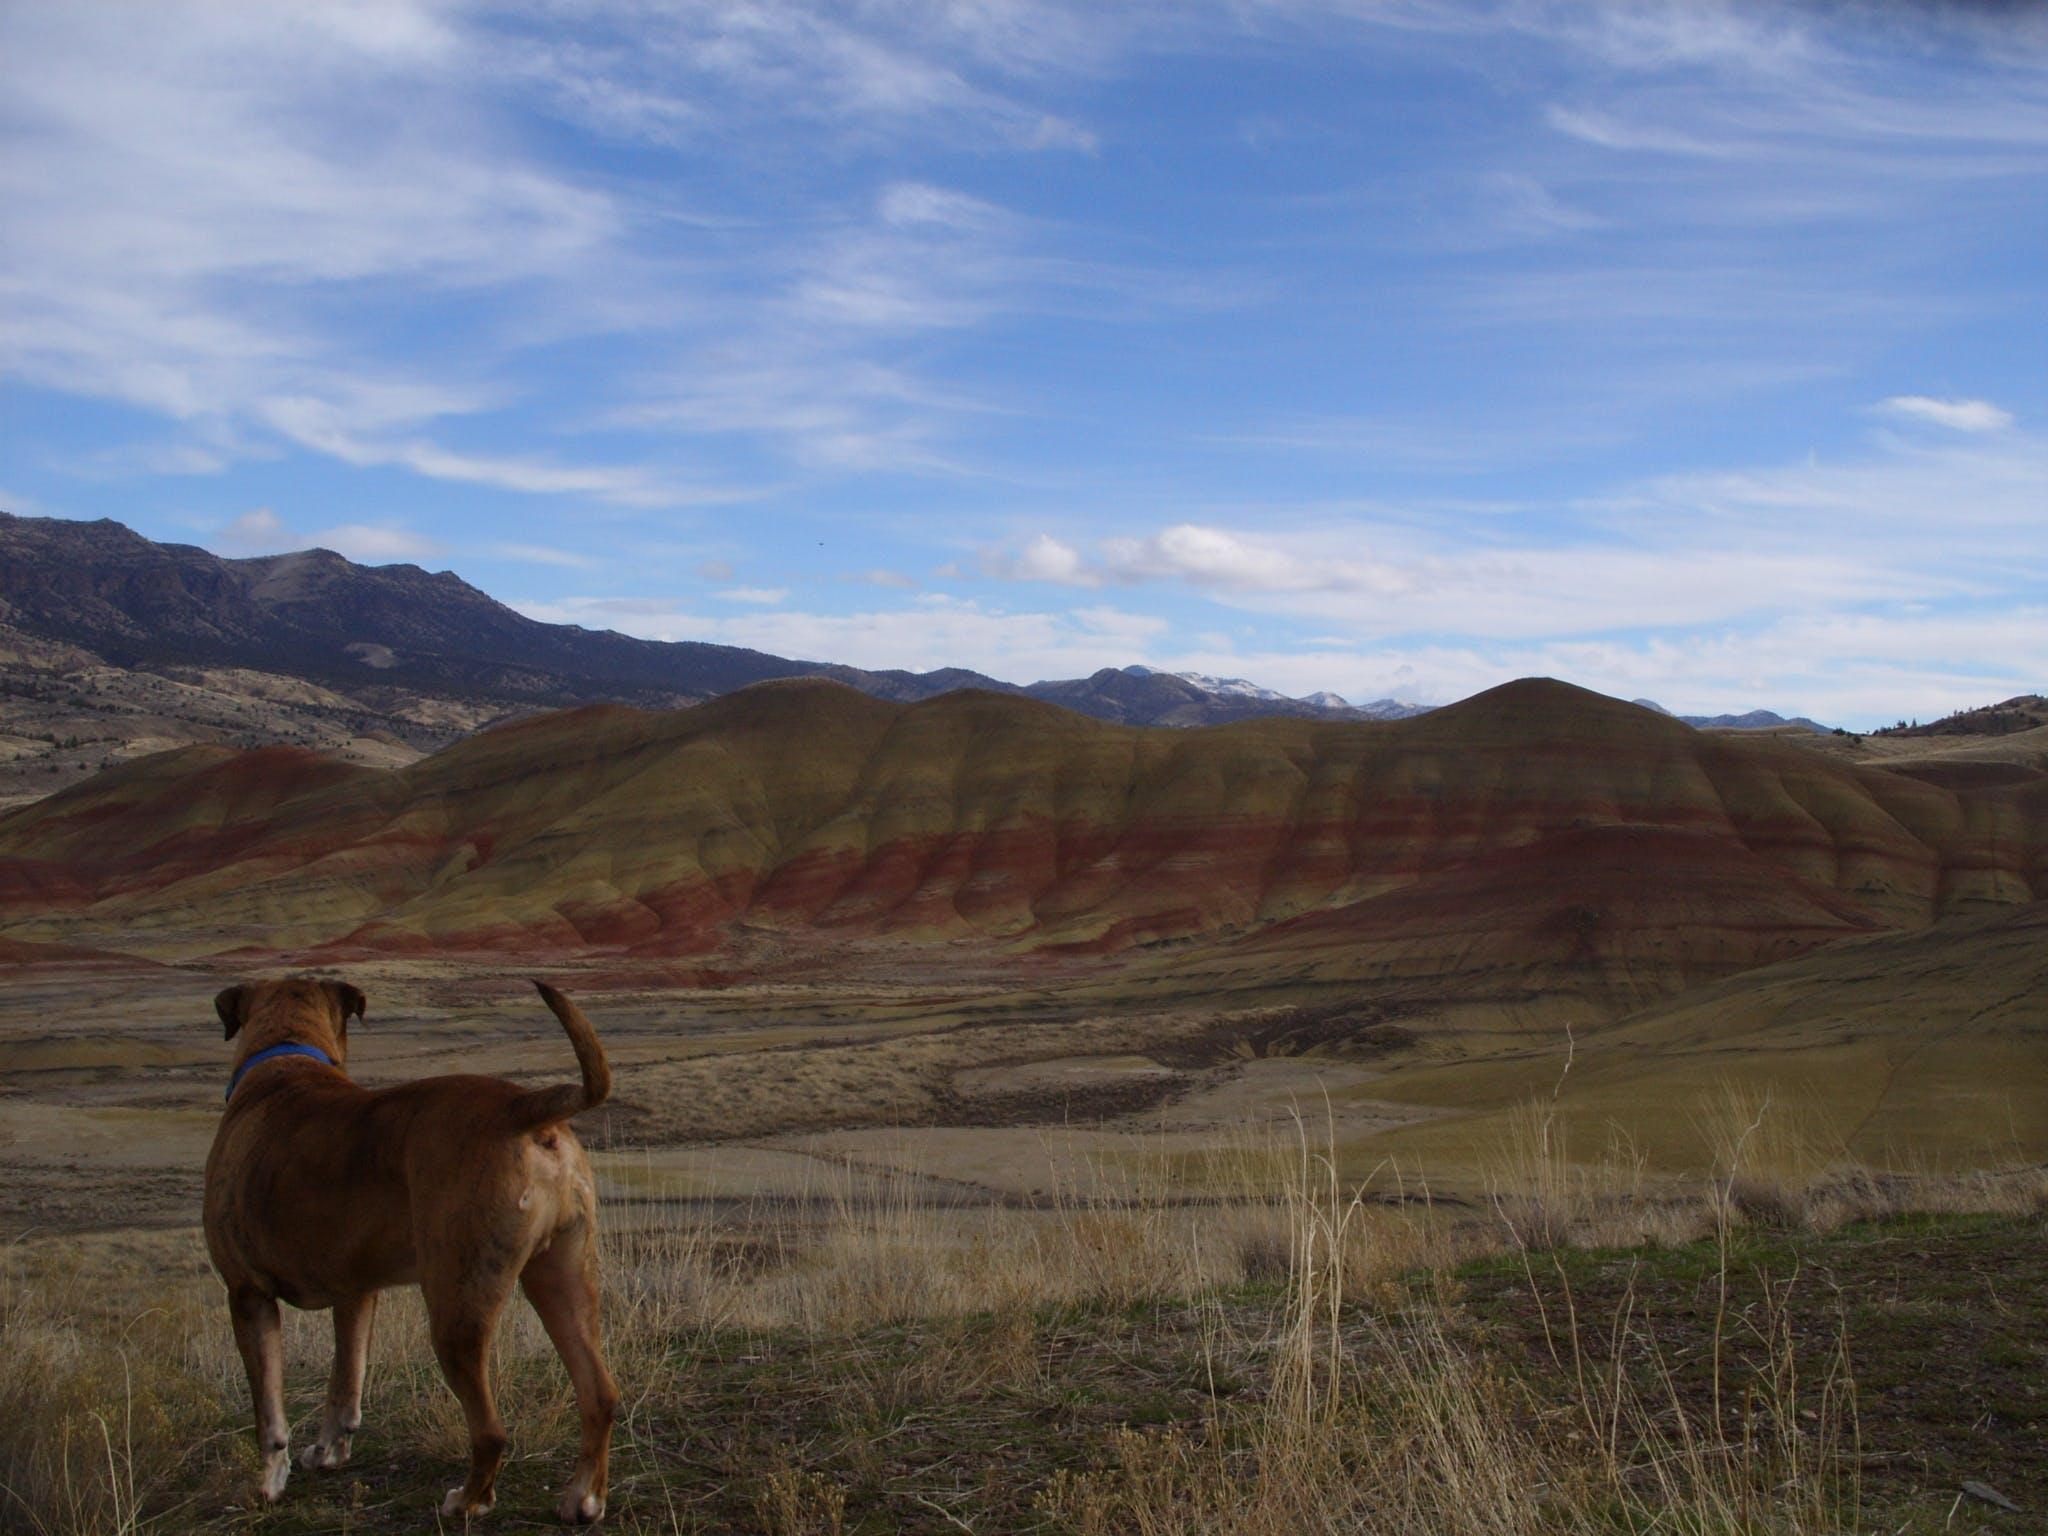 Free stock photo of Joe Leineweber, Painted Hills